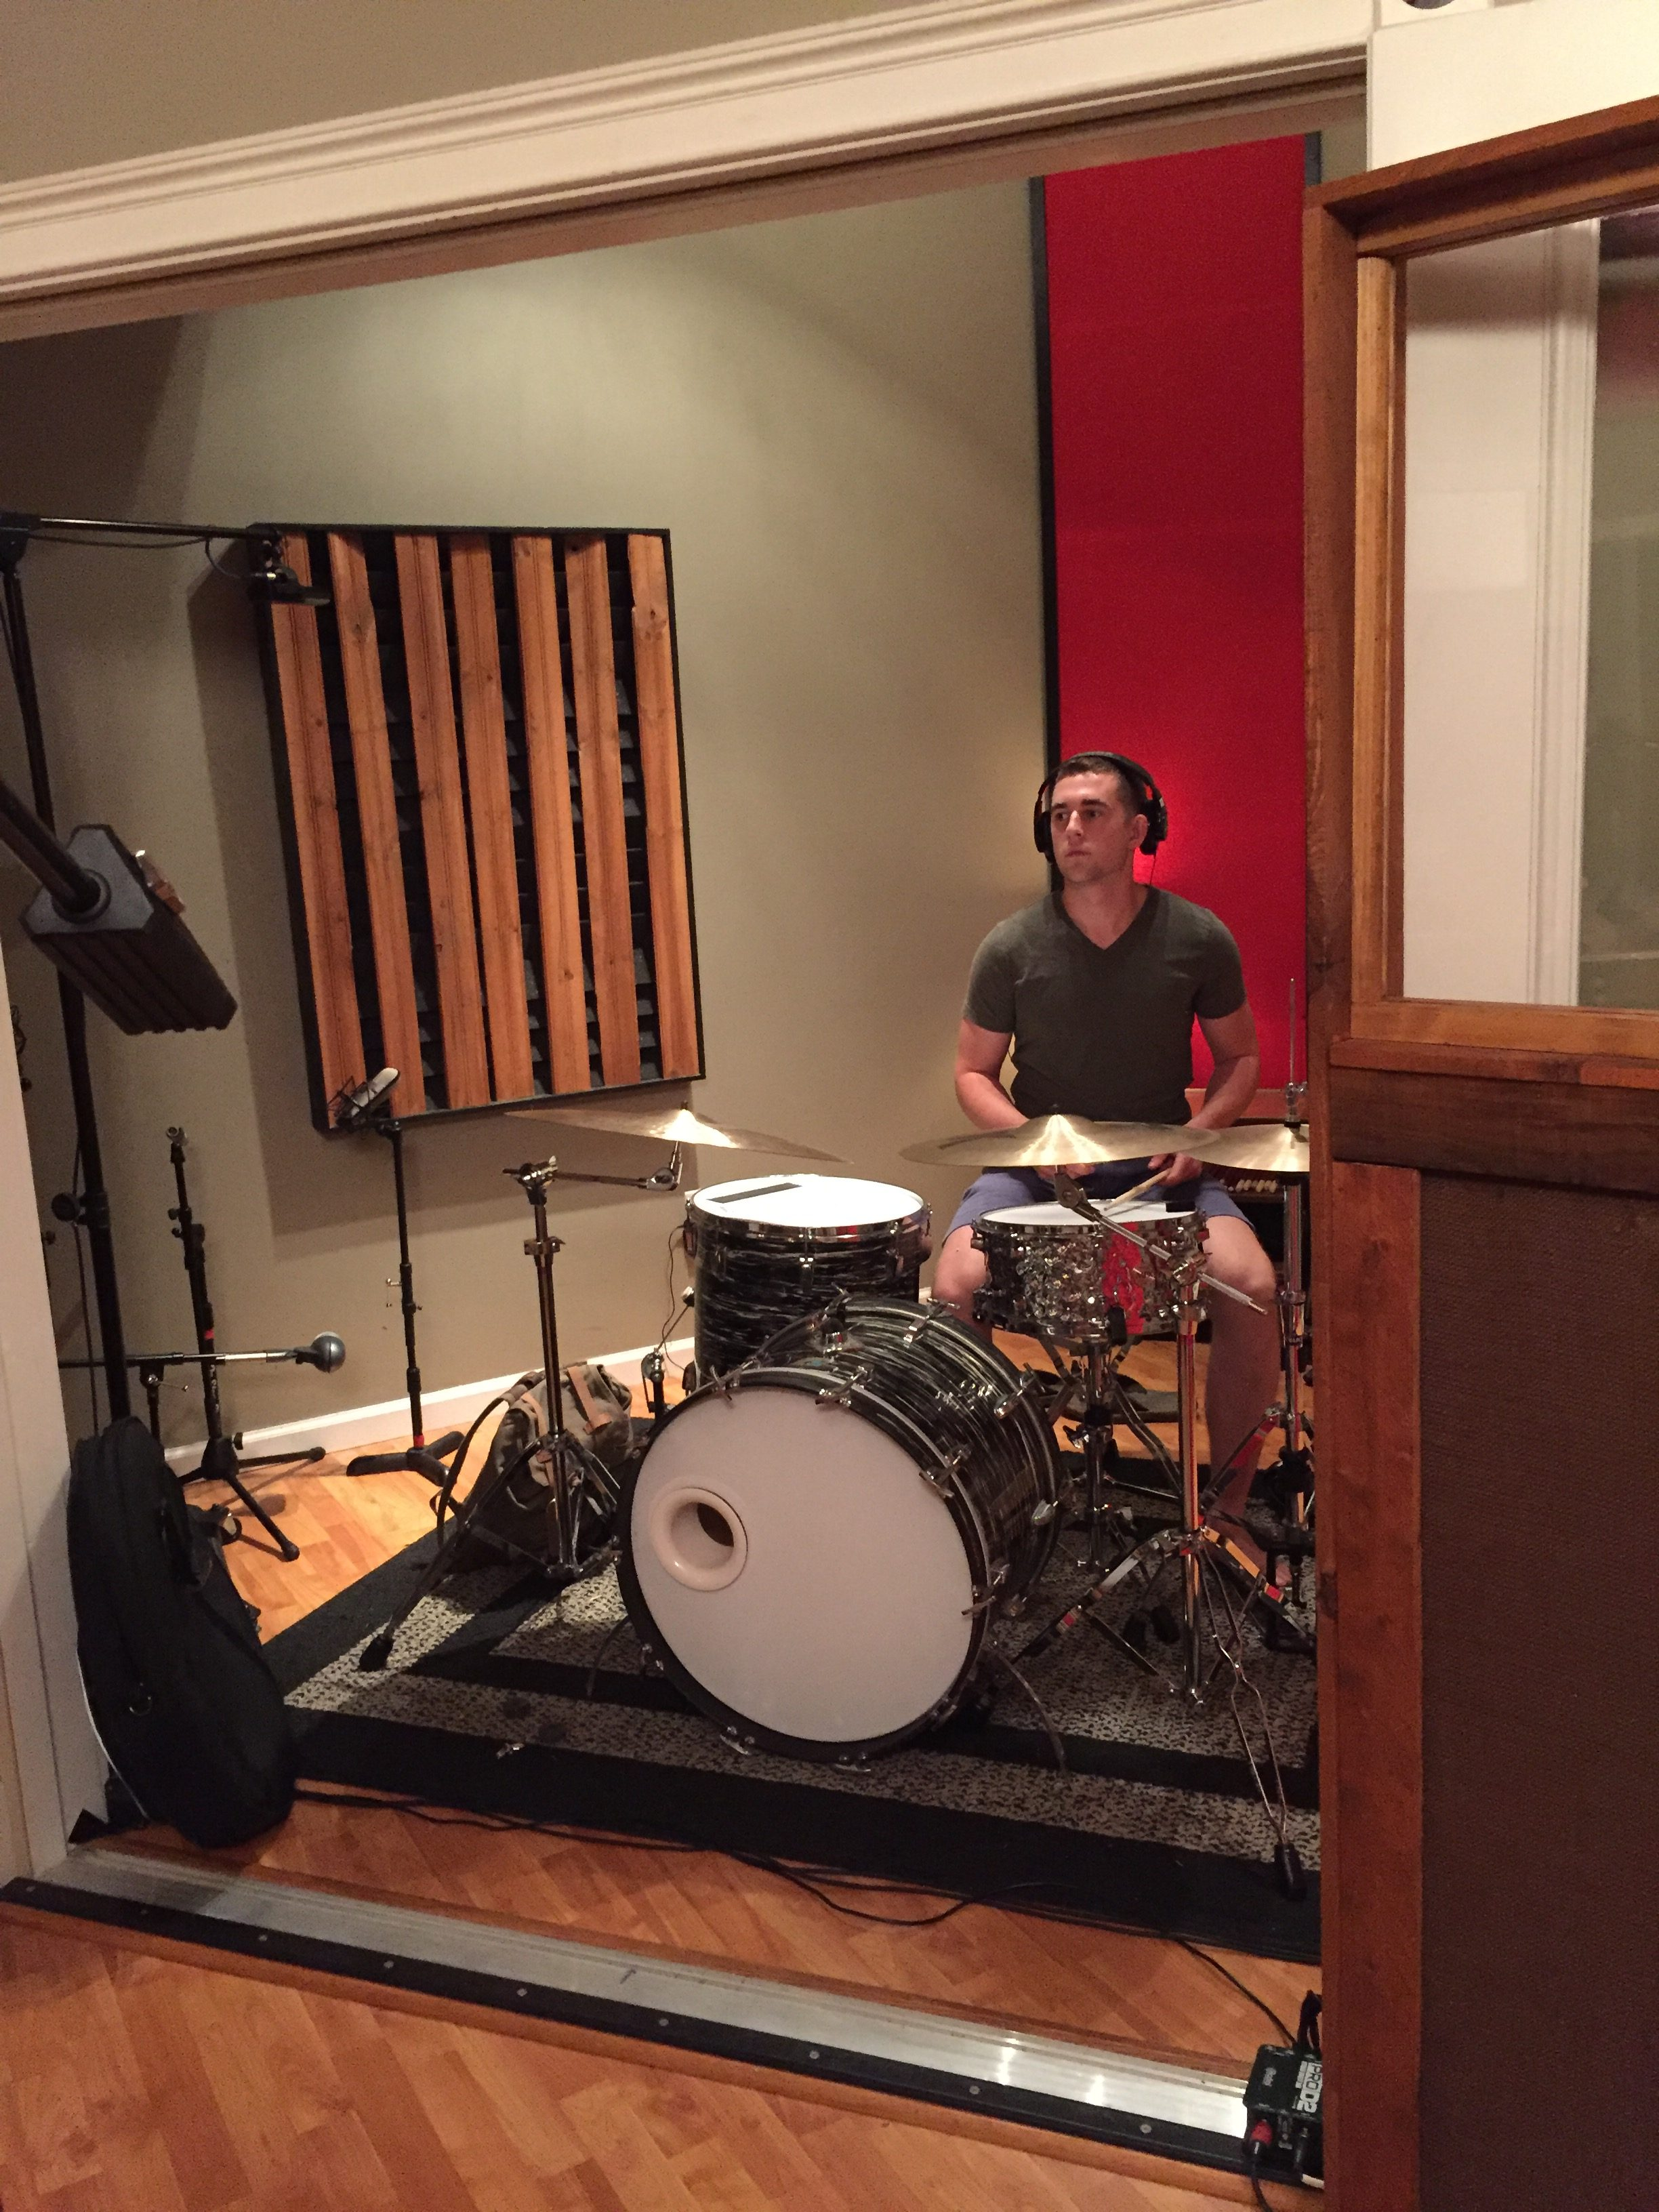 Rob, sound checking his drum kit.